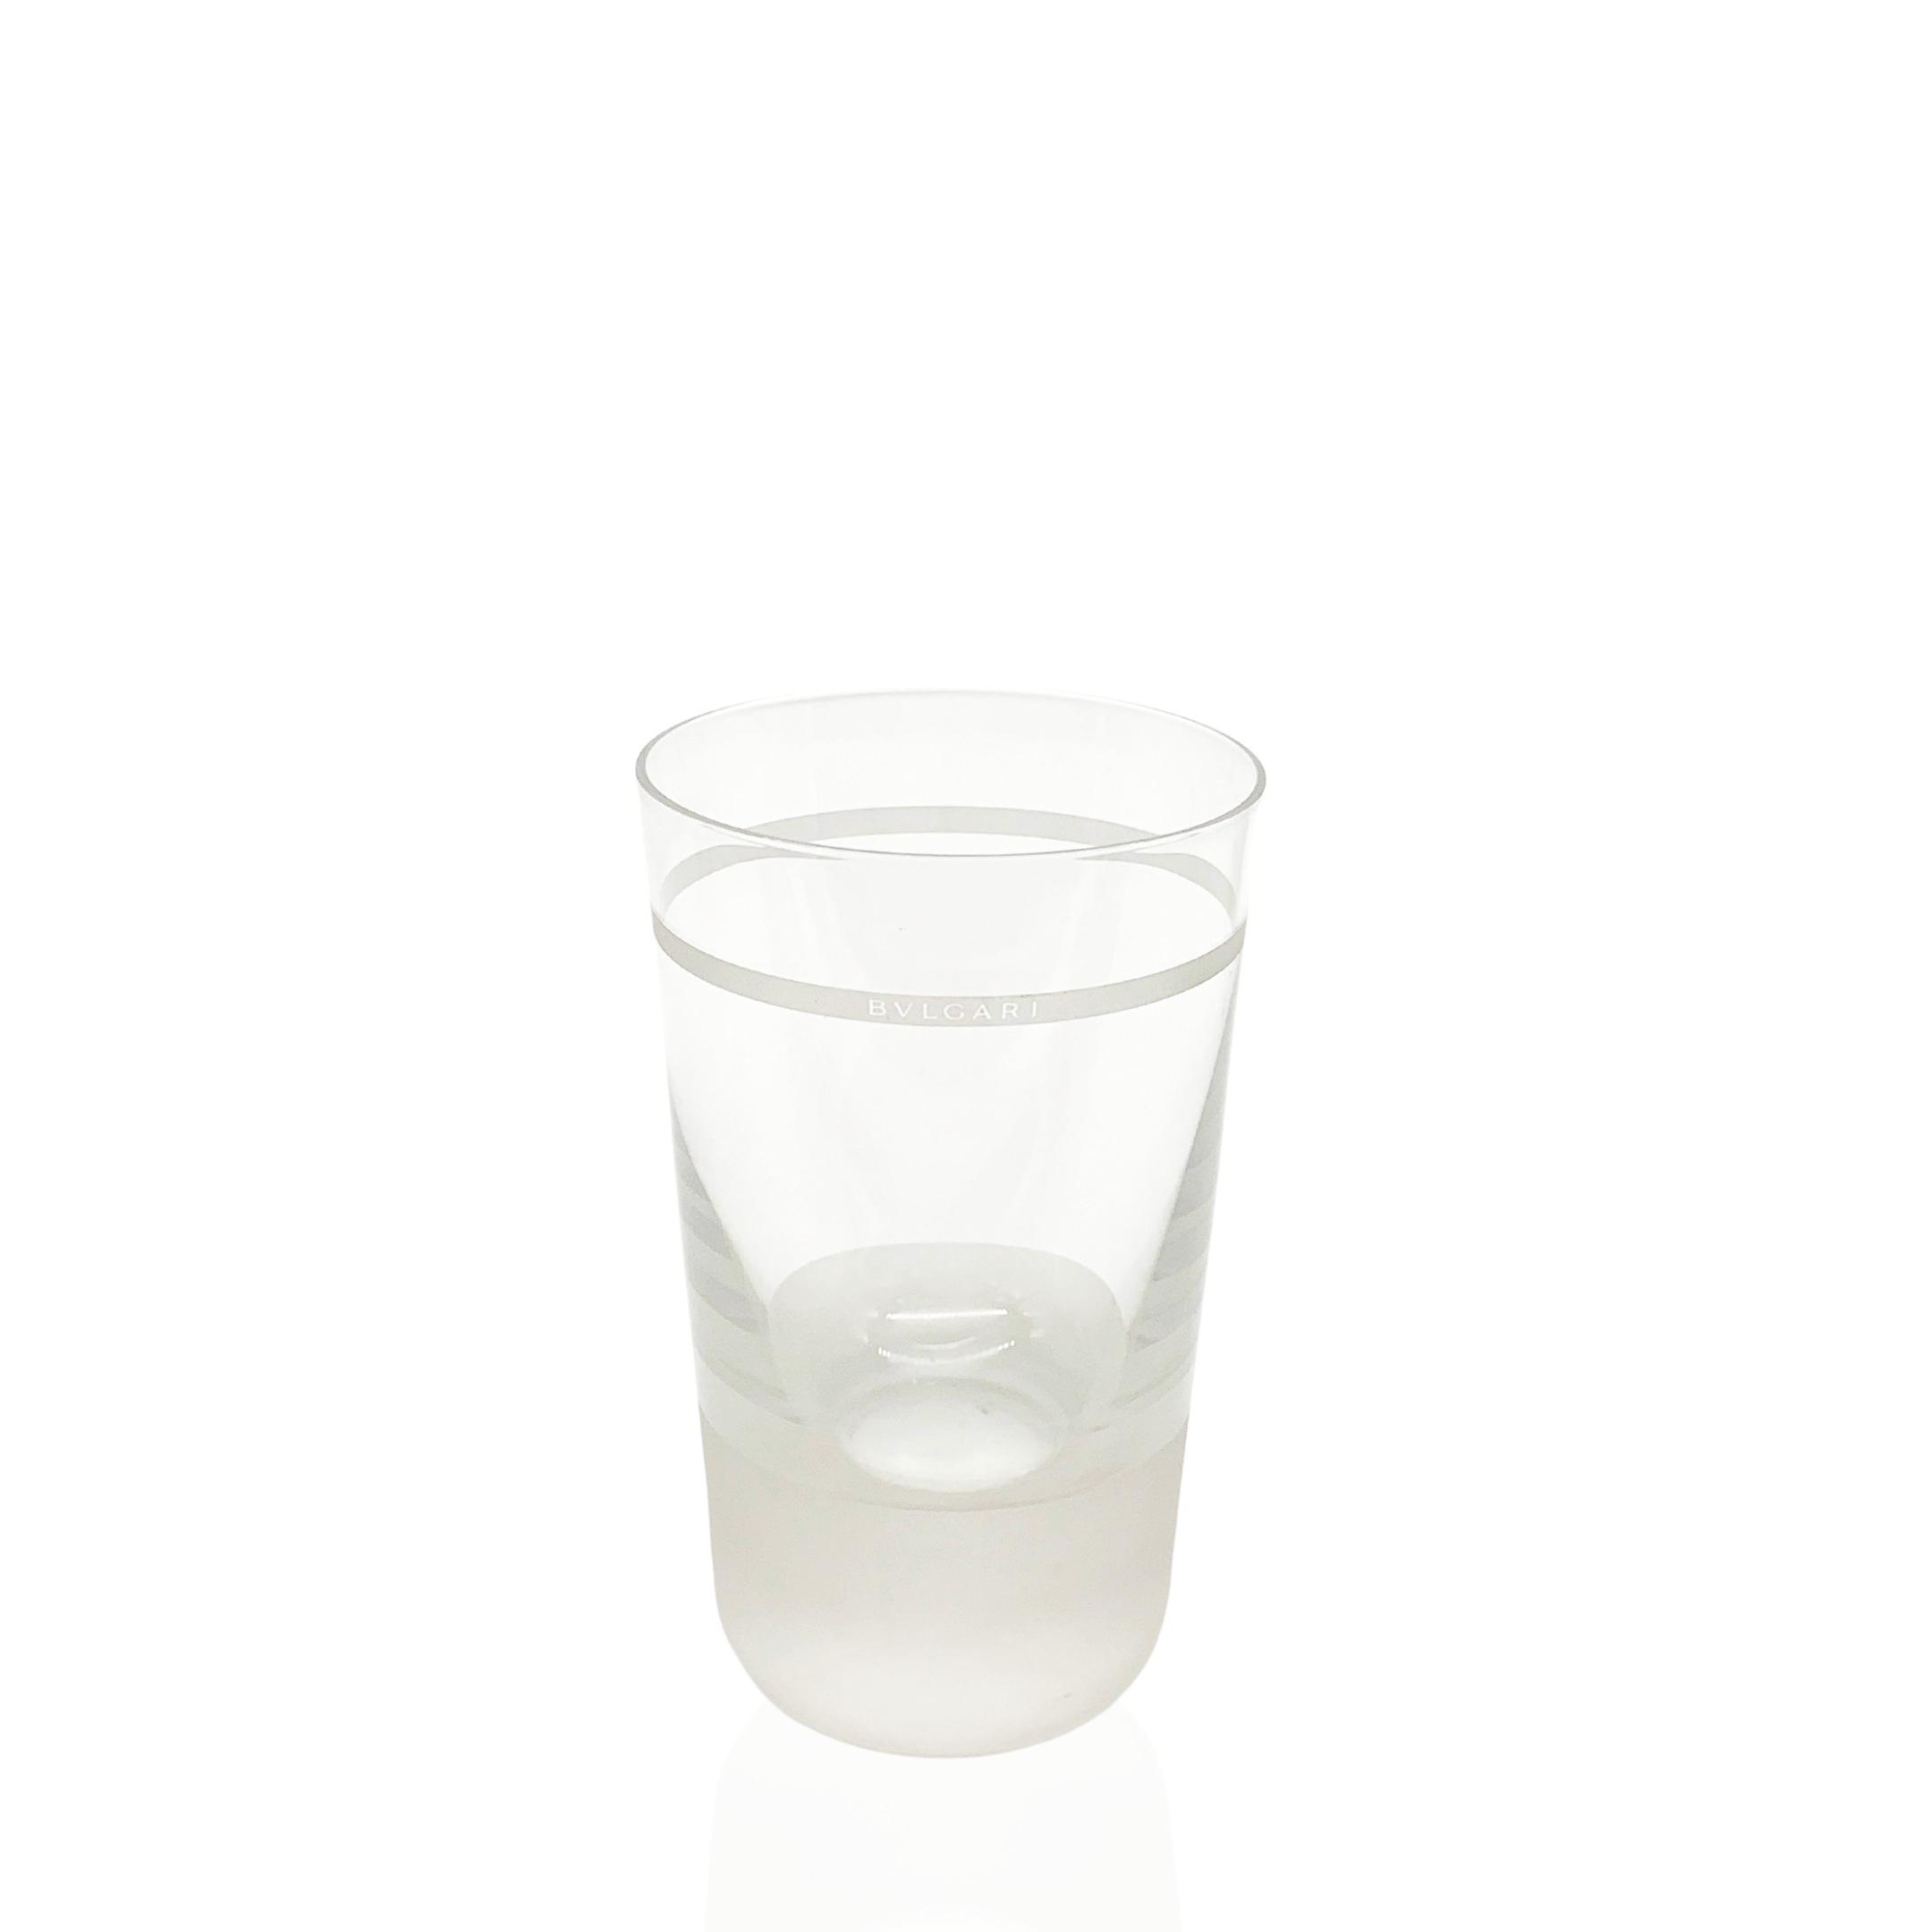 BVLGARI GLASS SCONTO DISCOUNT BICCHIERE Whisky